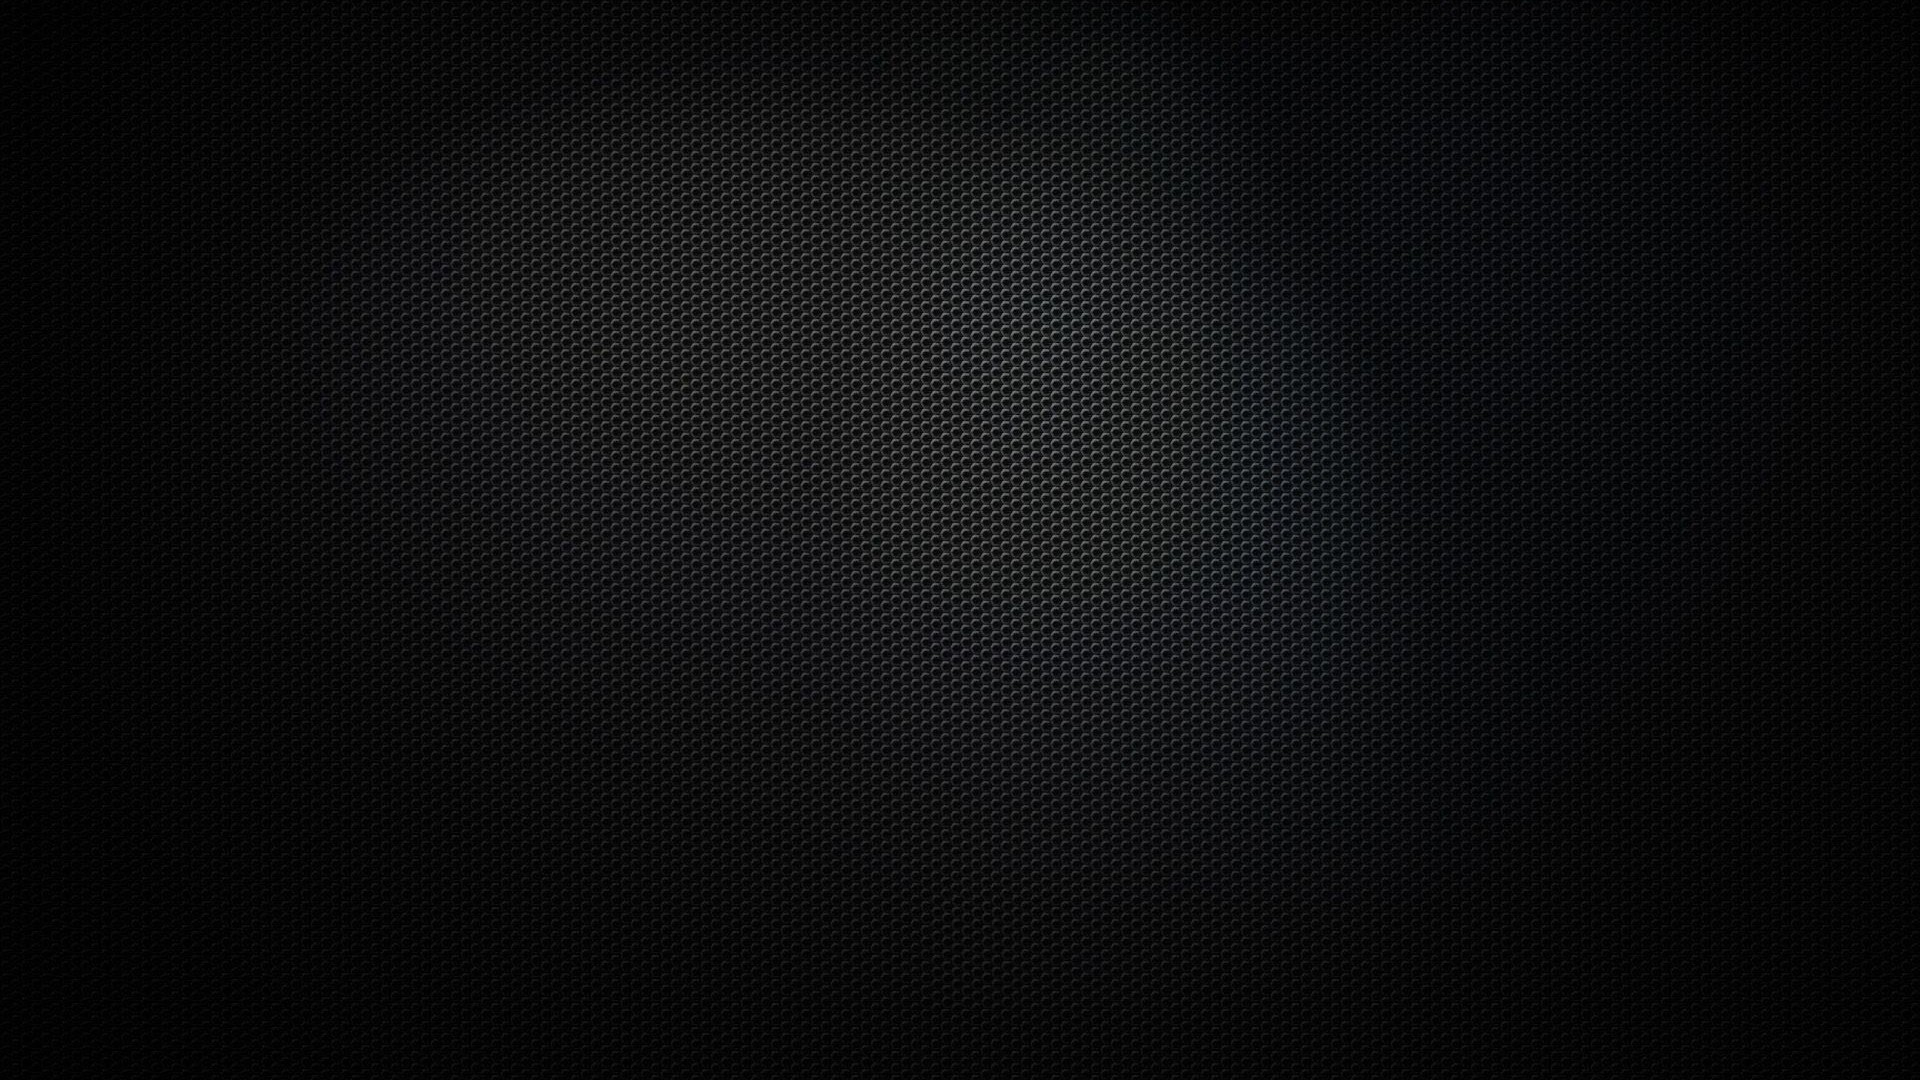 Wallpaper Black Background Sf Wallpaper